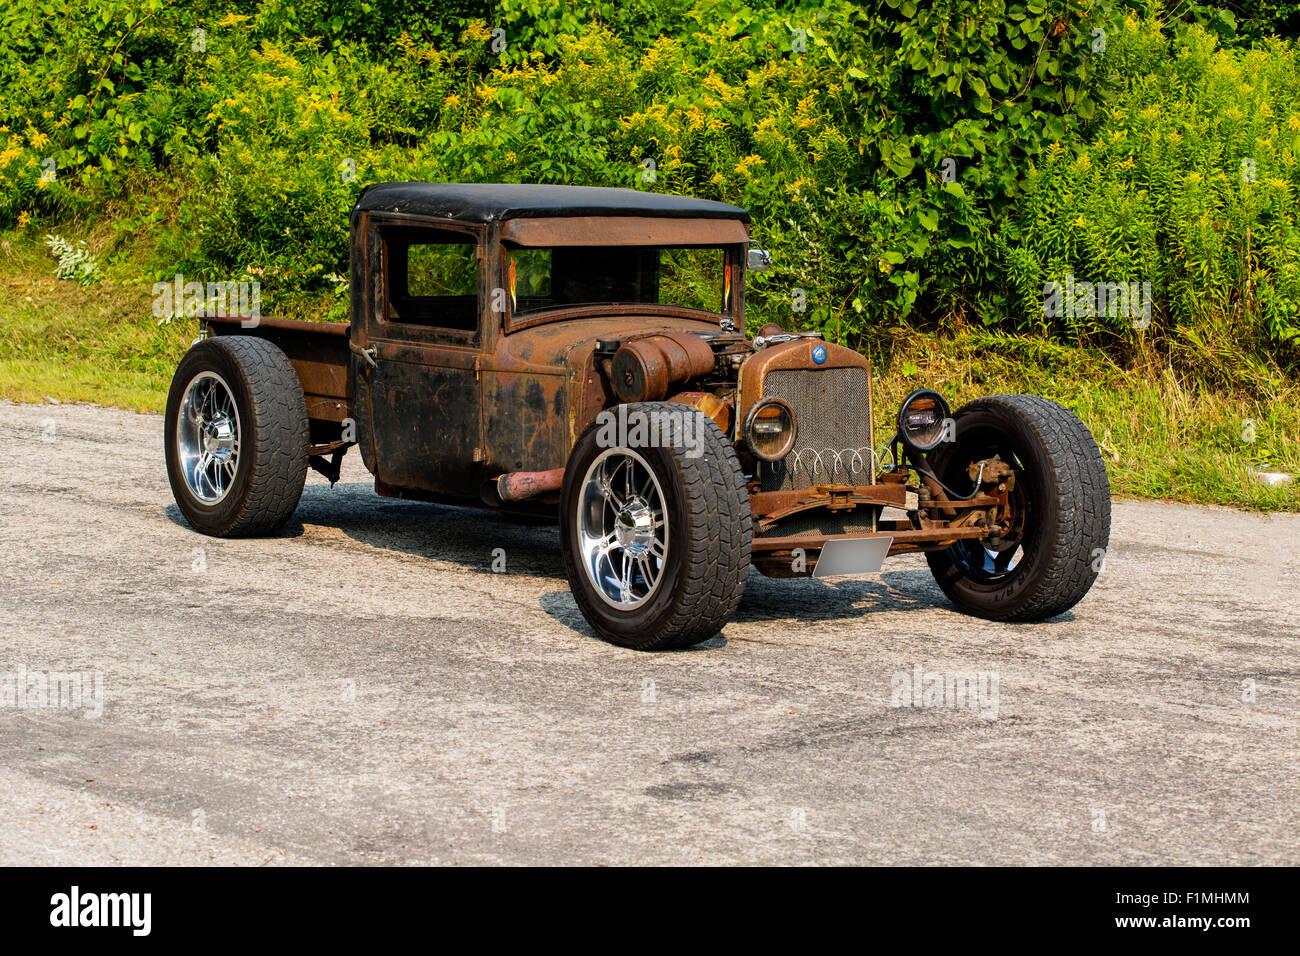 1940 1930 Stock Photos Images Alamy Plymouth Wiring Diagram Sedan Rat Rod On Pavement Image